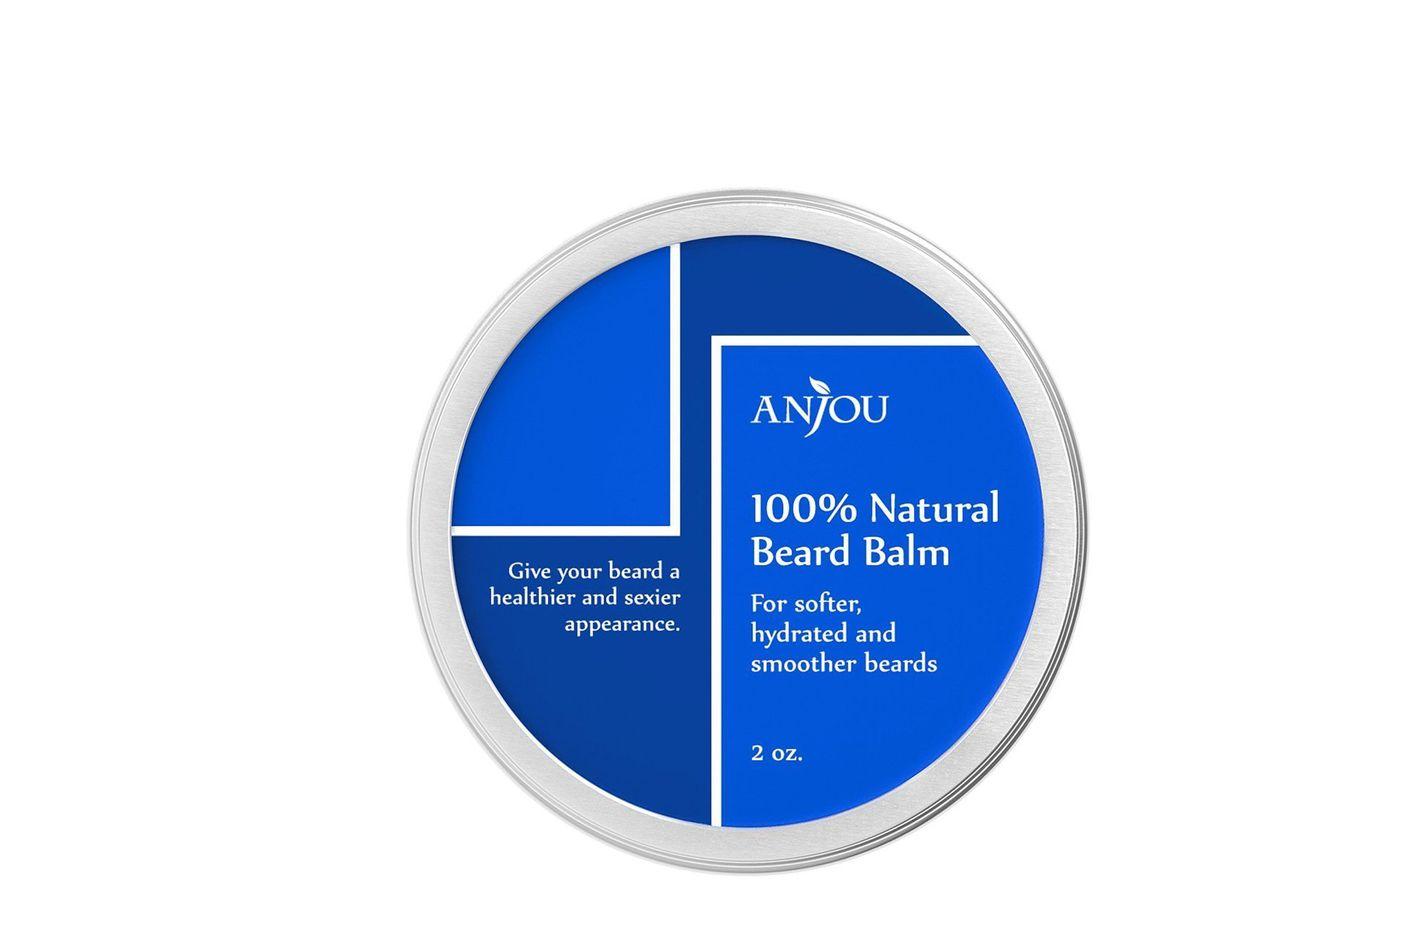 Anjou 100 Percent Natural Beard Balm